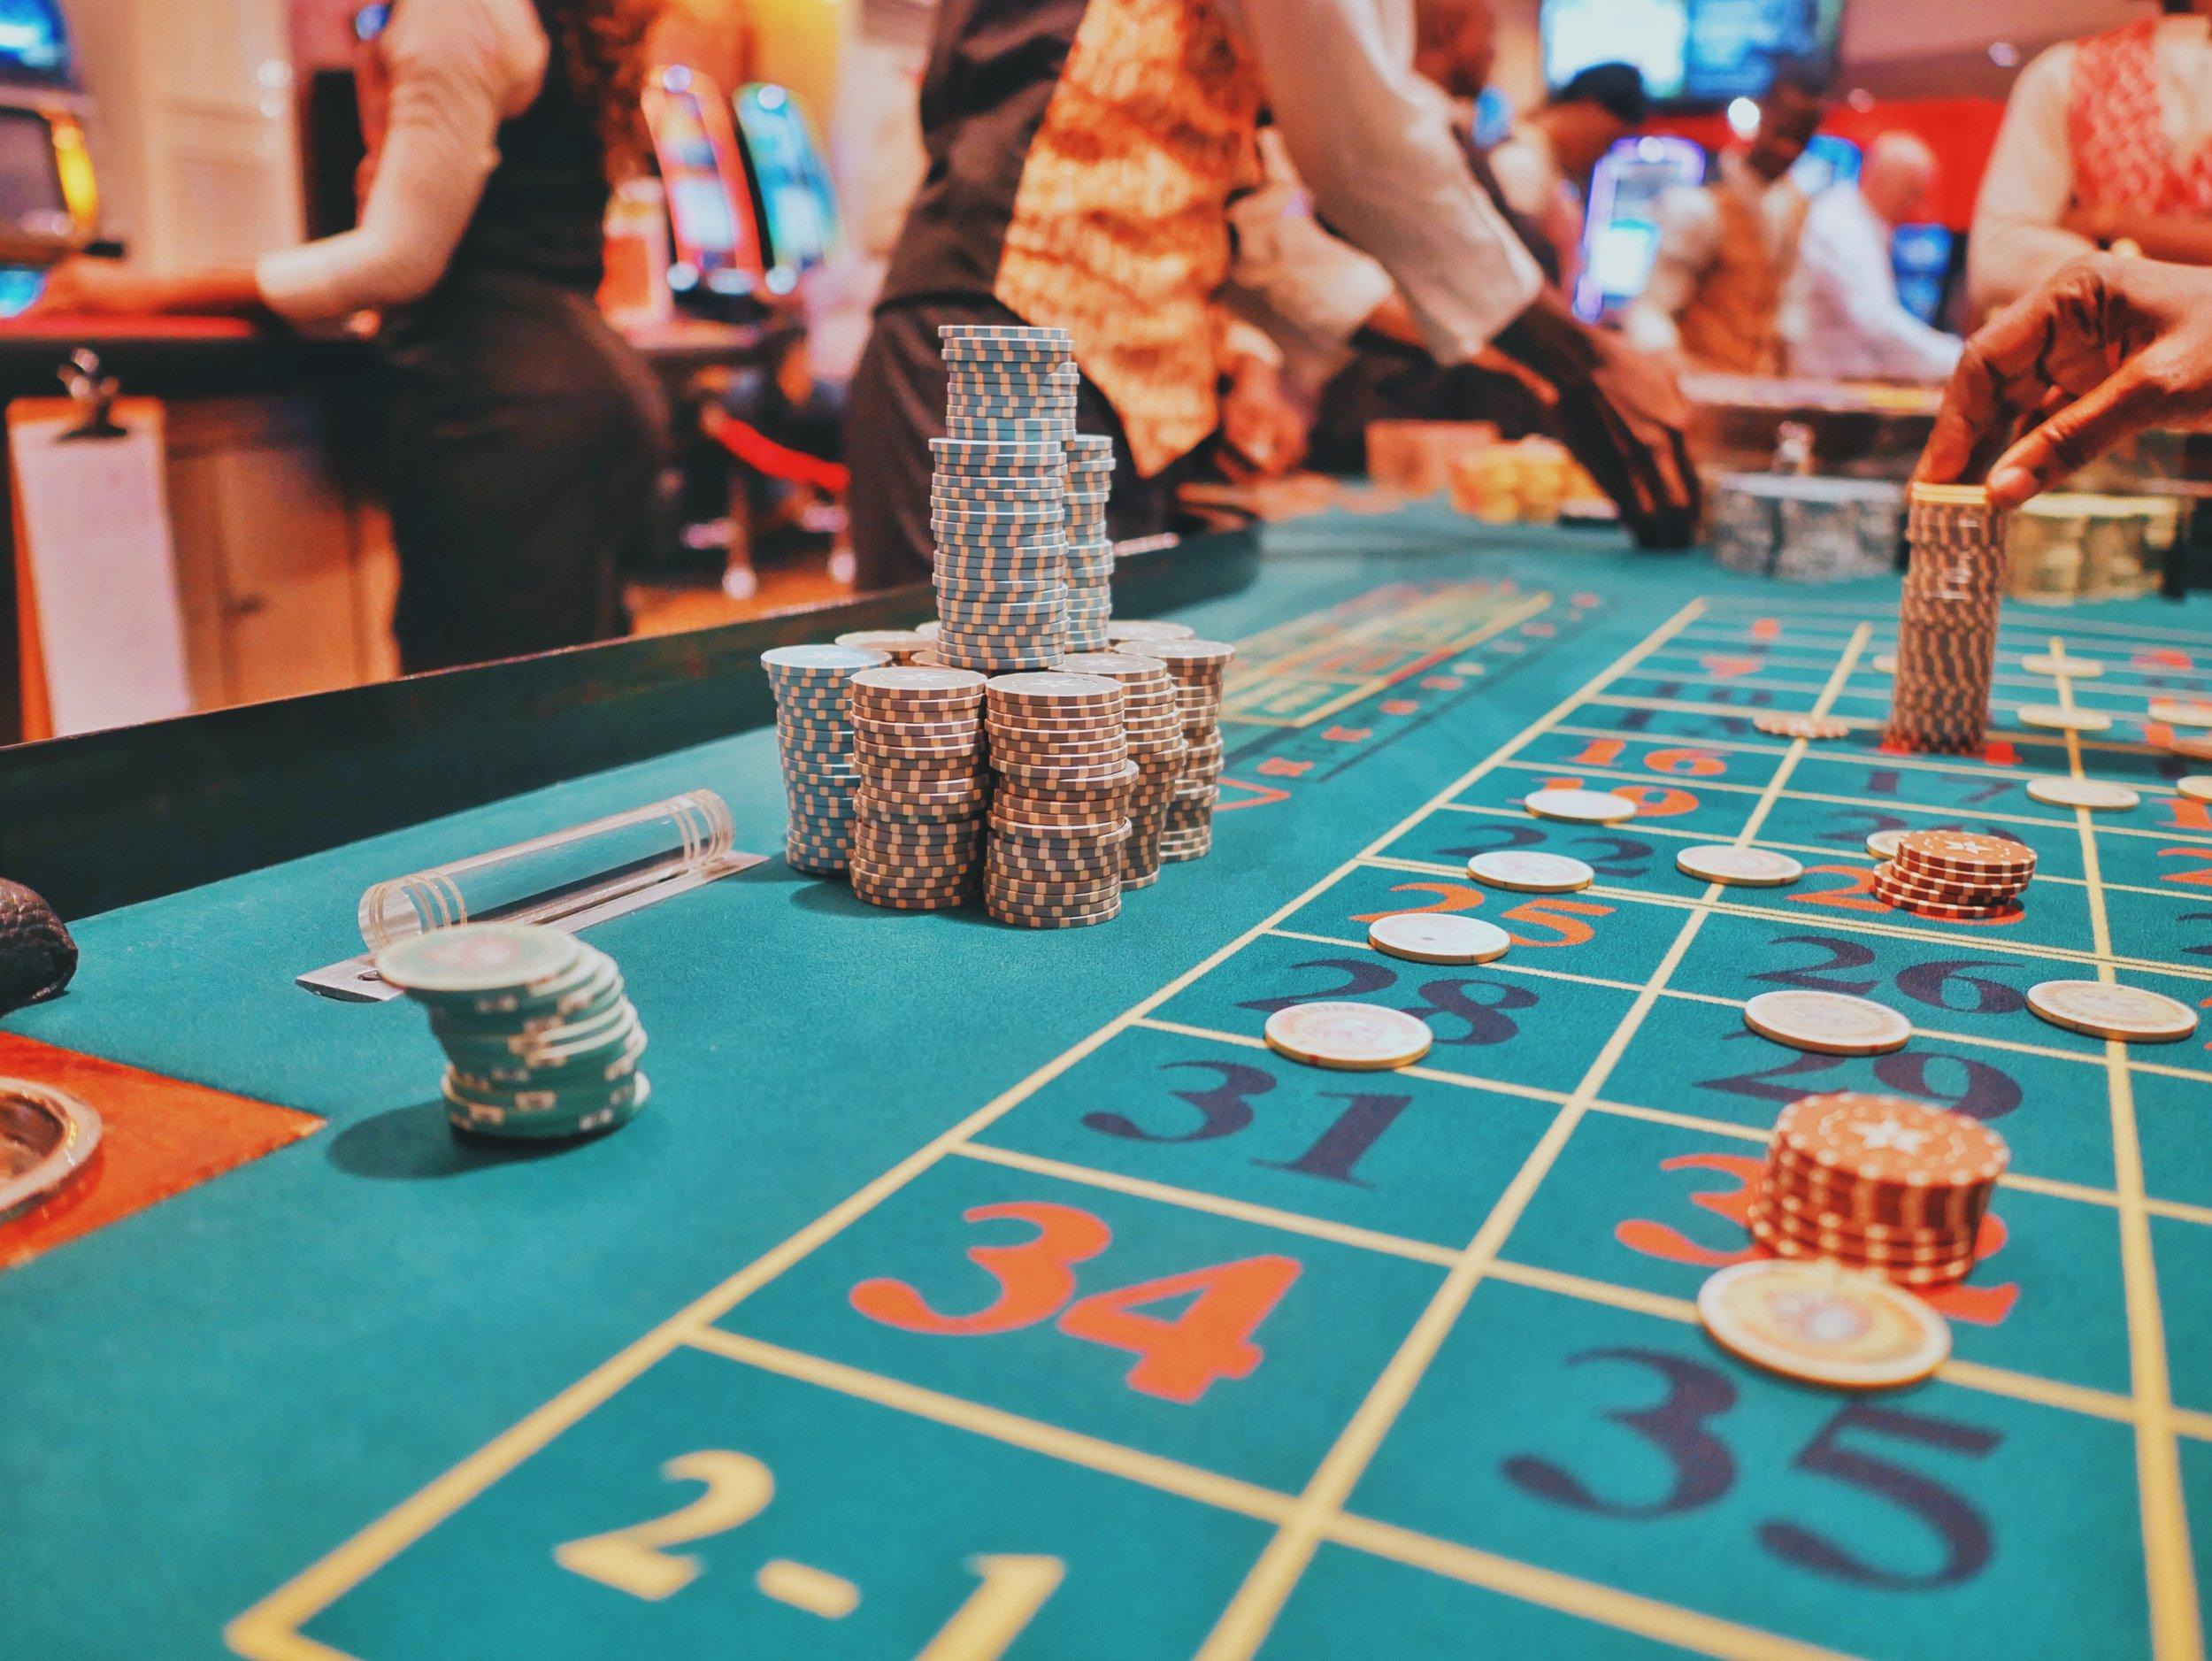 On Average Most Investors Lose Money - It's a crapshoot.